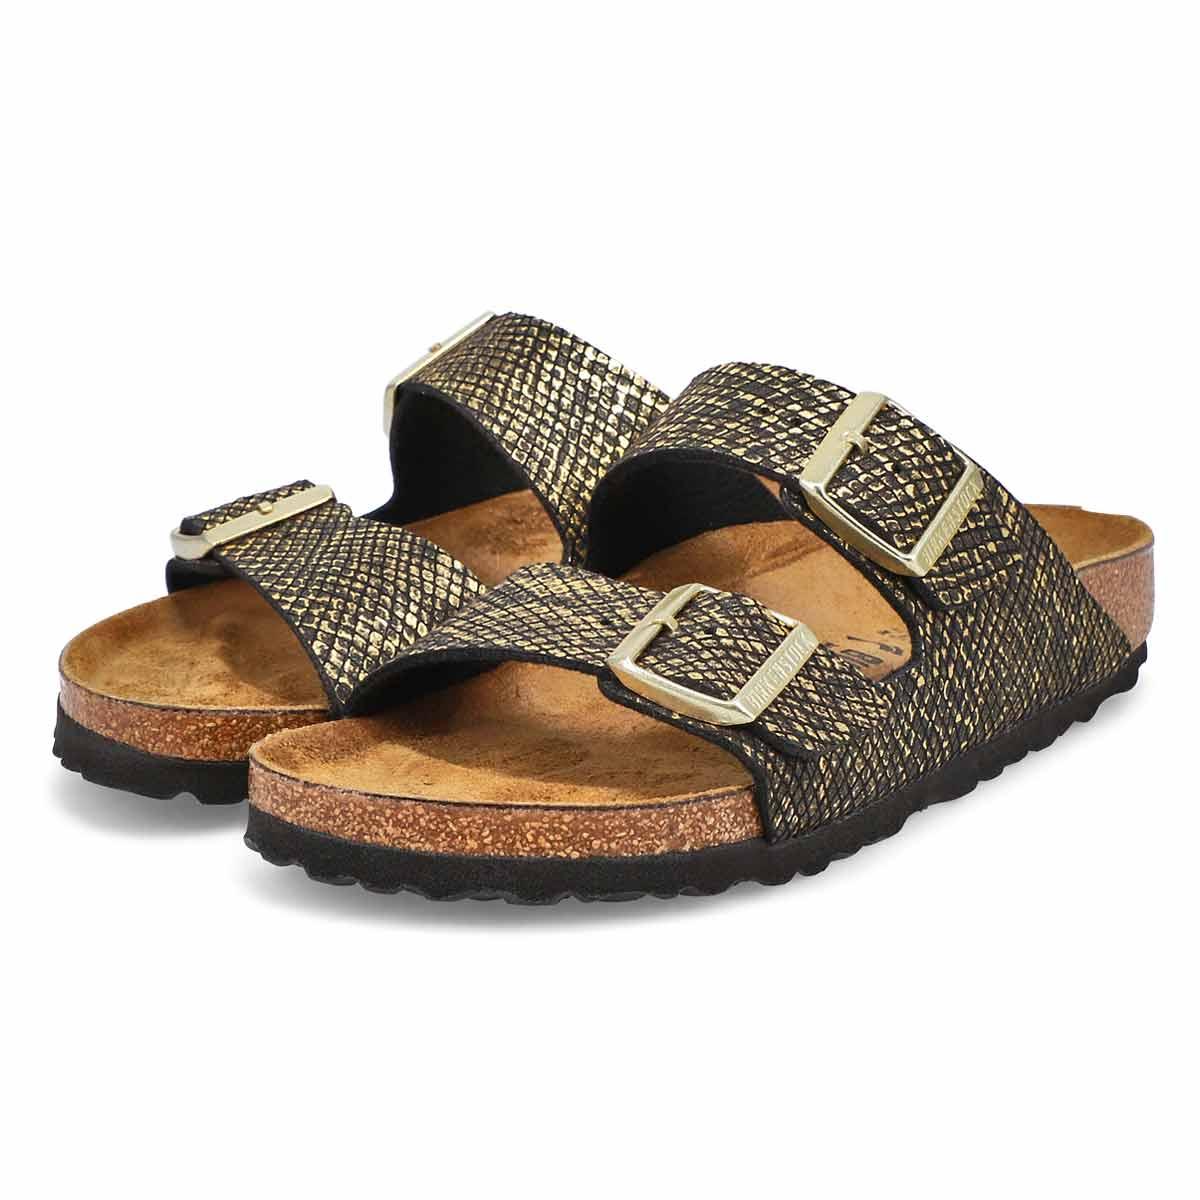 Women's Arizona Narrow Sandal - Python Black/Gold